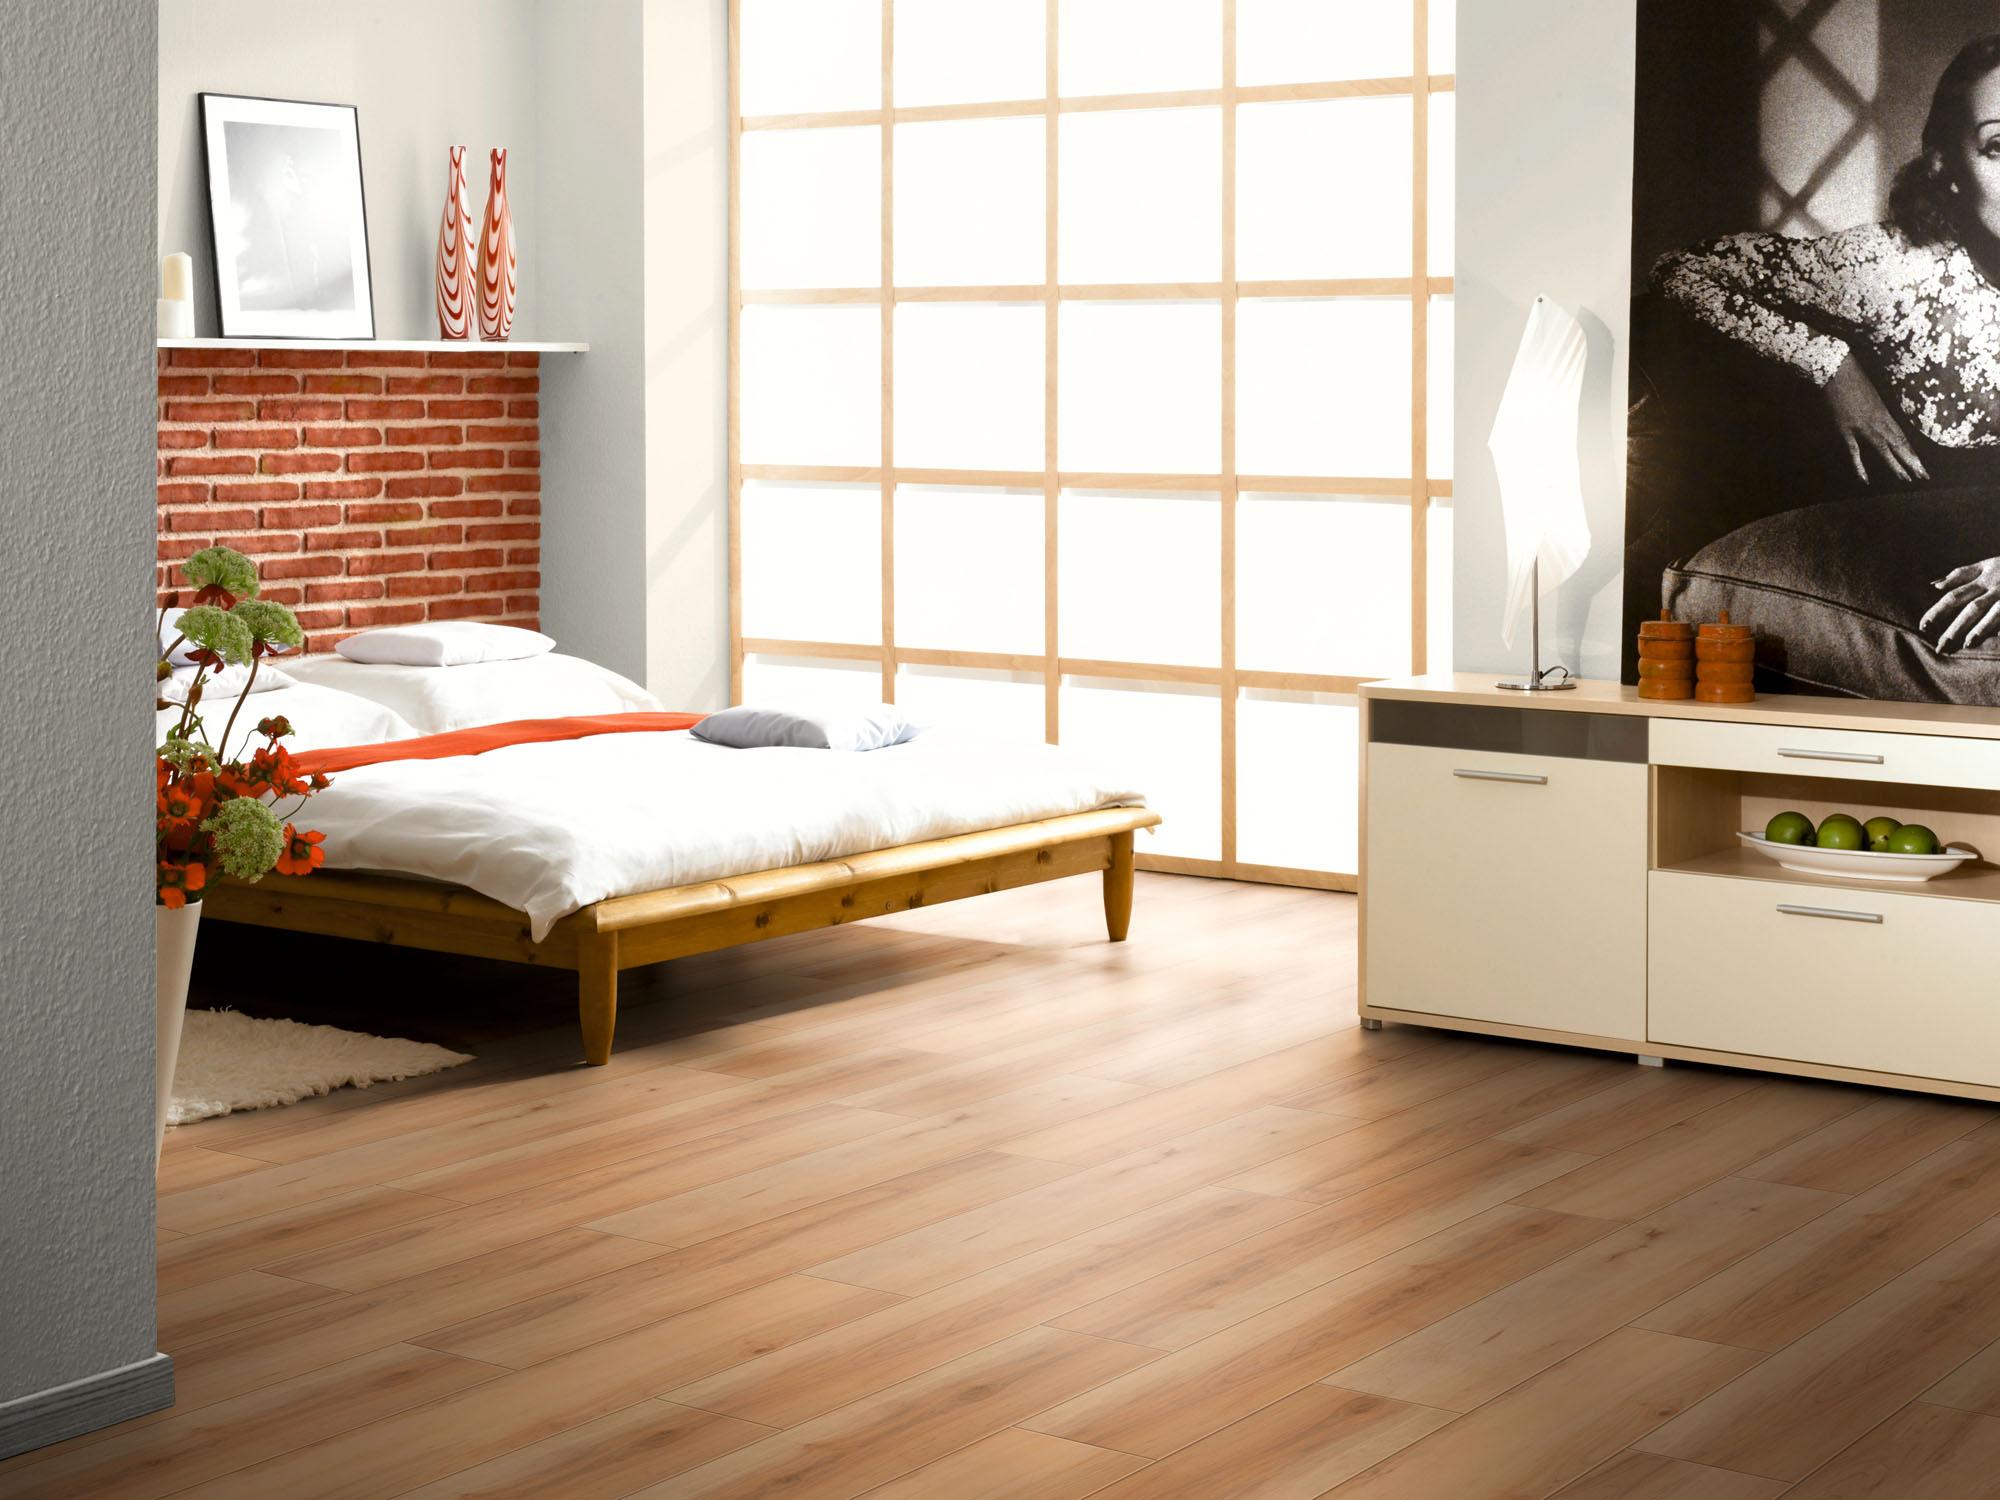 Amenajarea dormitoarelor moderne